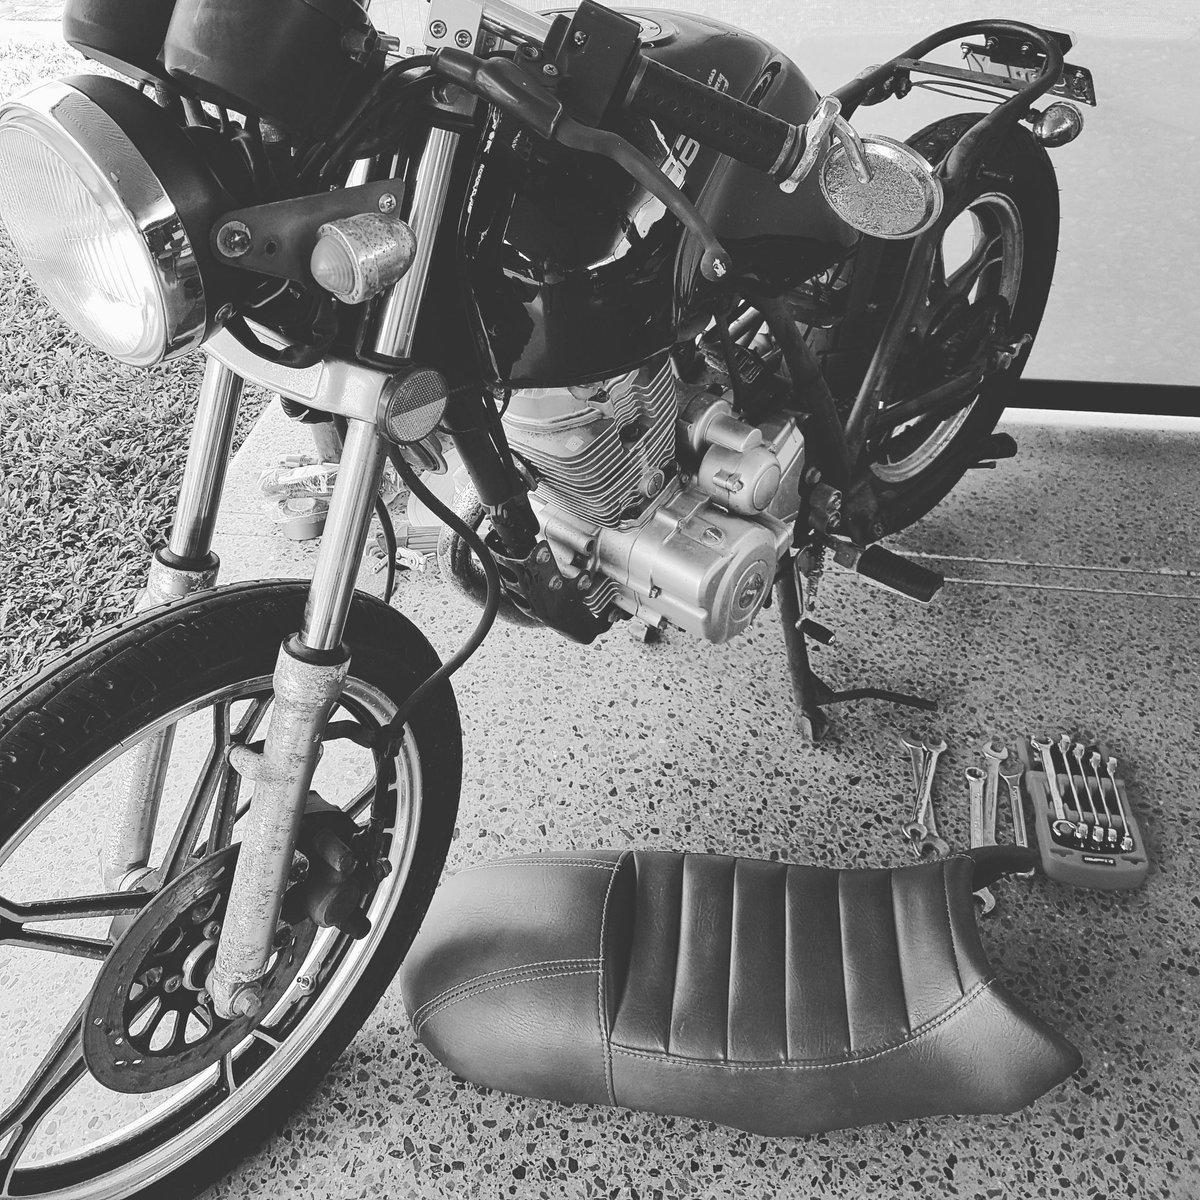 Gettin dis girl revamped #caferacer #custombike #womenwhoride pic.twitter.com/Ljrjfai0pz